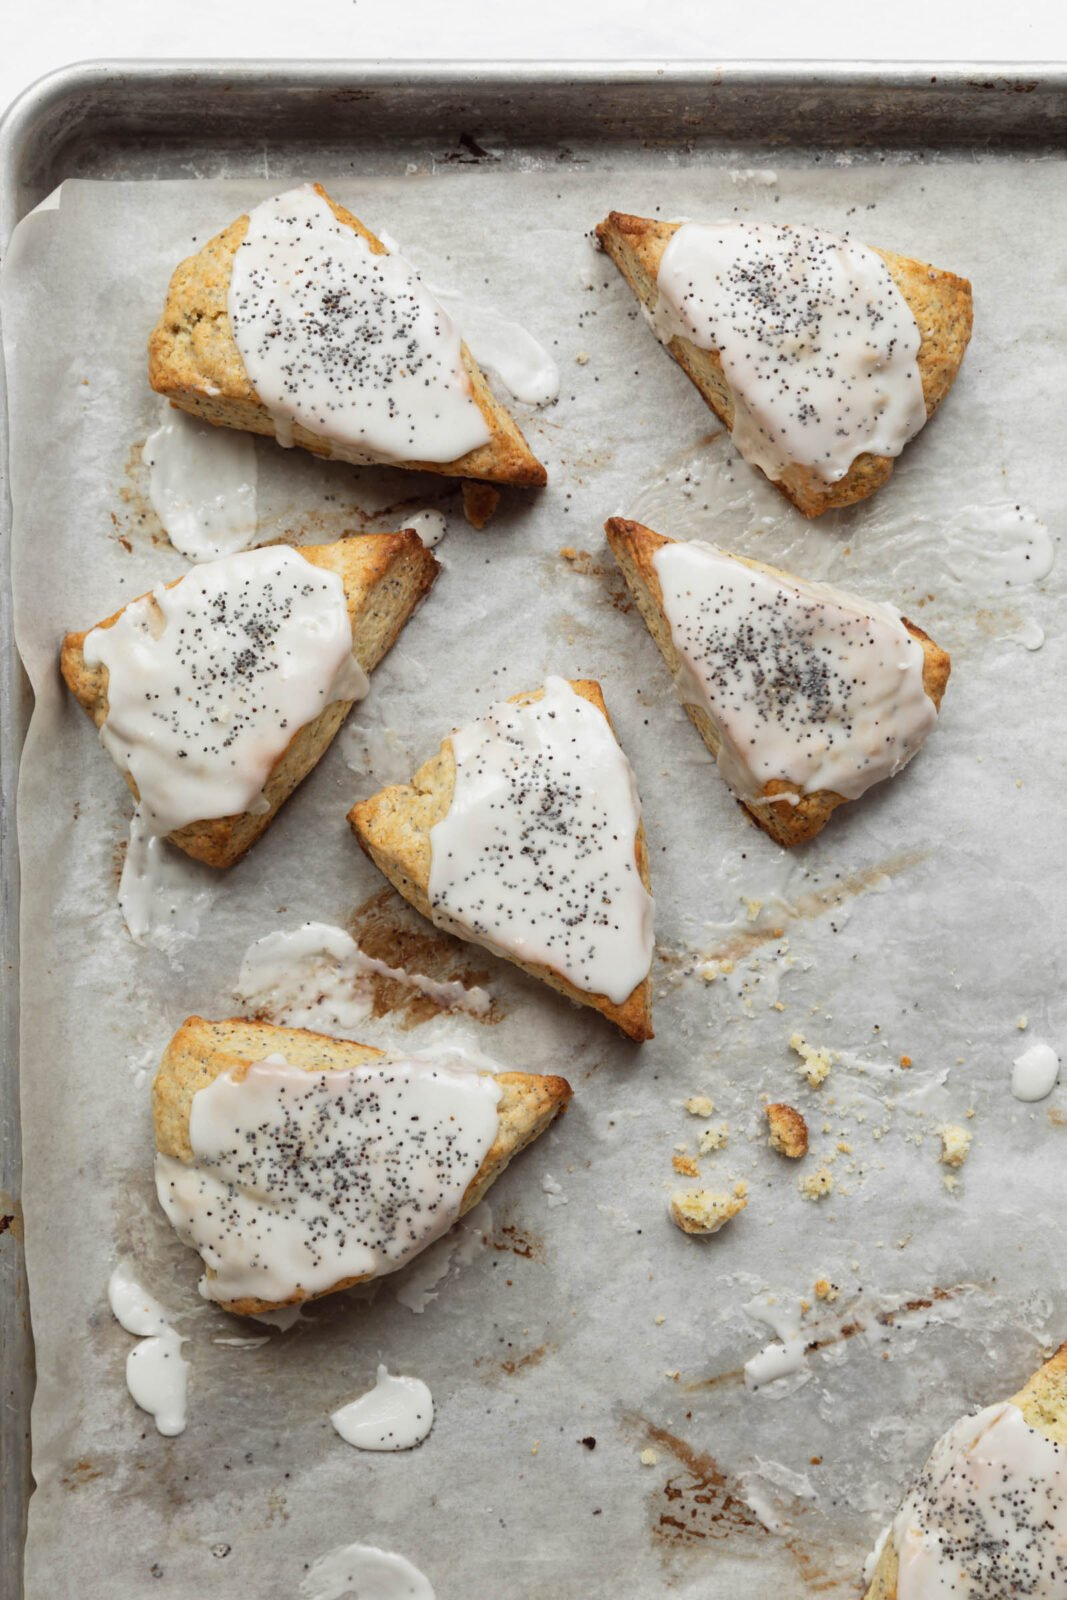 lemon poppyseed scones on a baking sheet